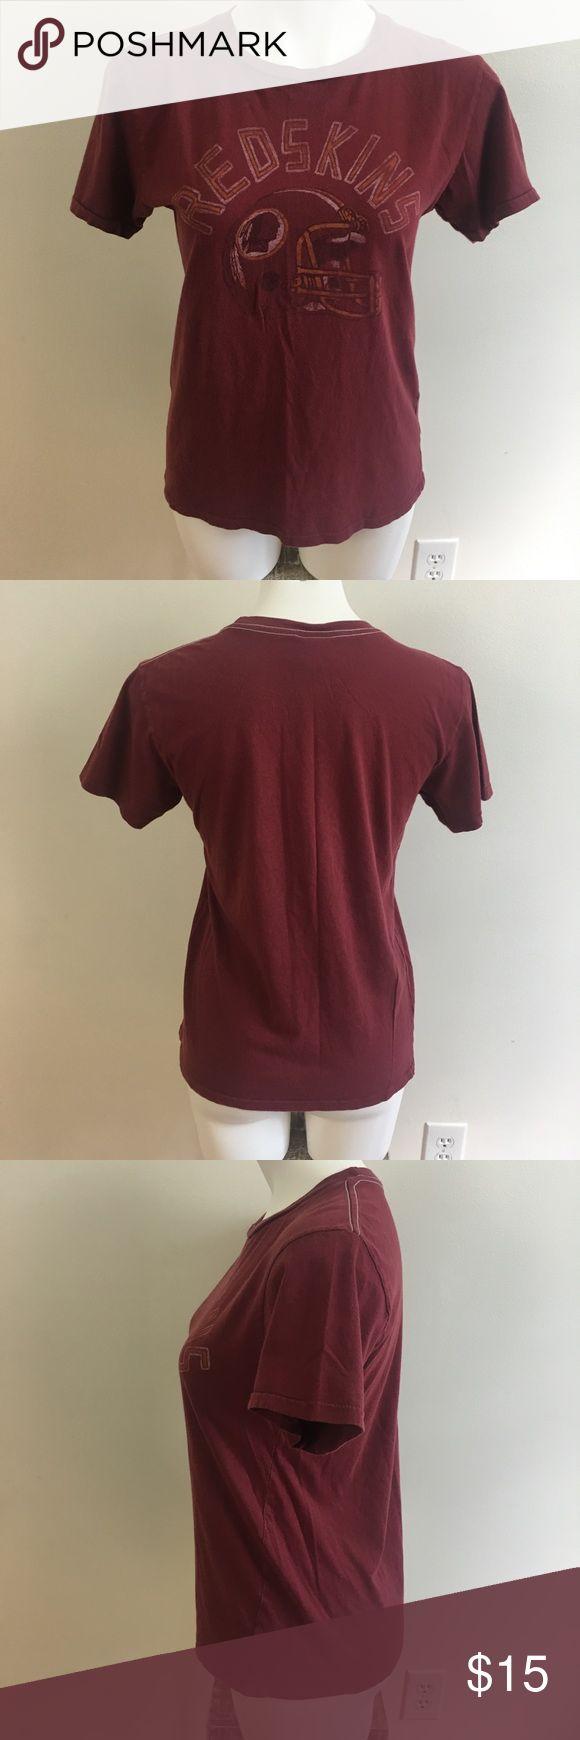 Washington Redskins Retro Graphic T Shirt Junk Food, NFL Washington Redskins, vintage worn look, good condition Junk Food Tops Tees - Short Sleeve